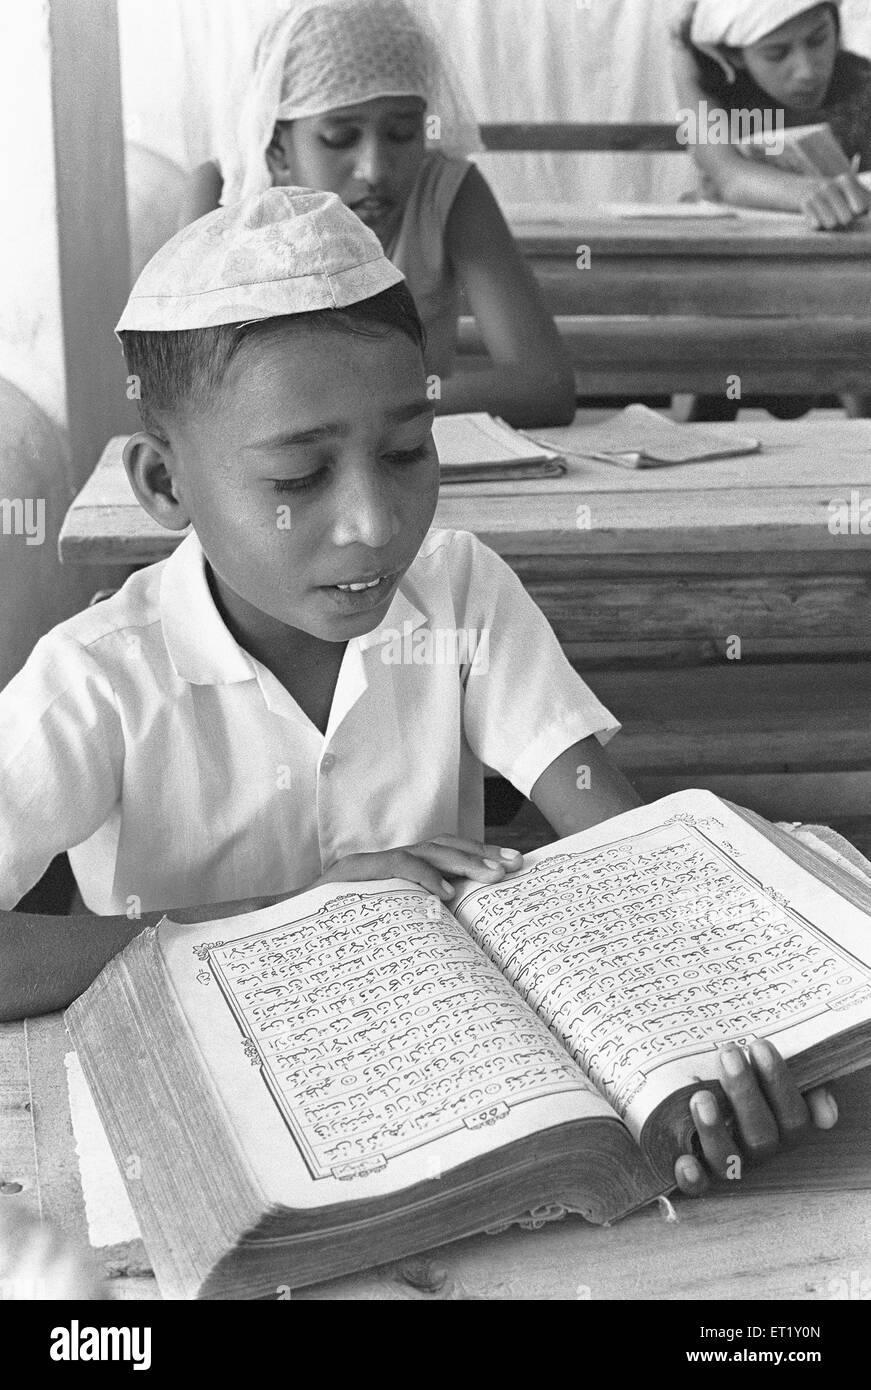 Pupil in classroom ; Male capital of Maldives NO MR - Stock Image